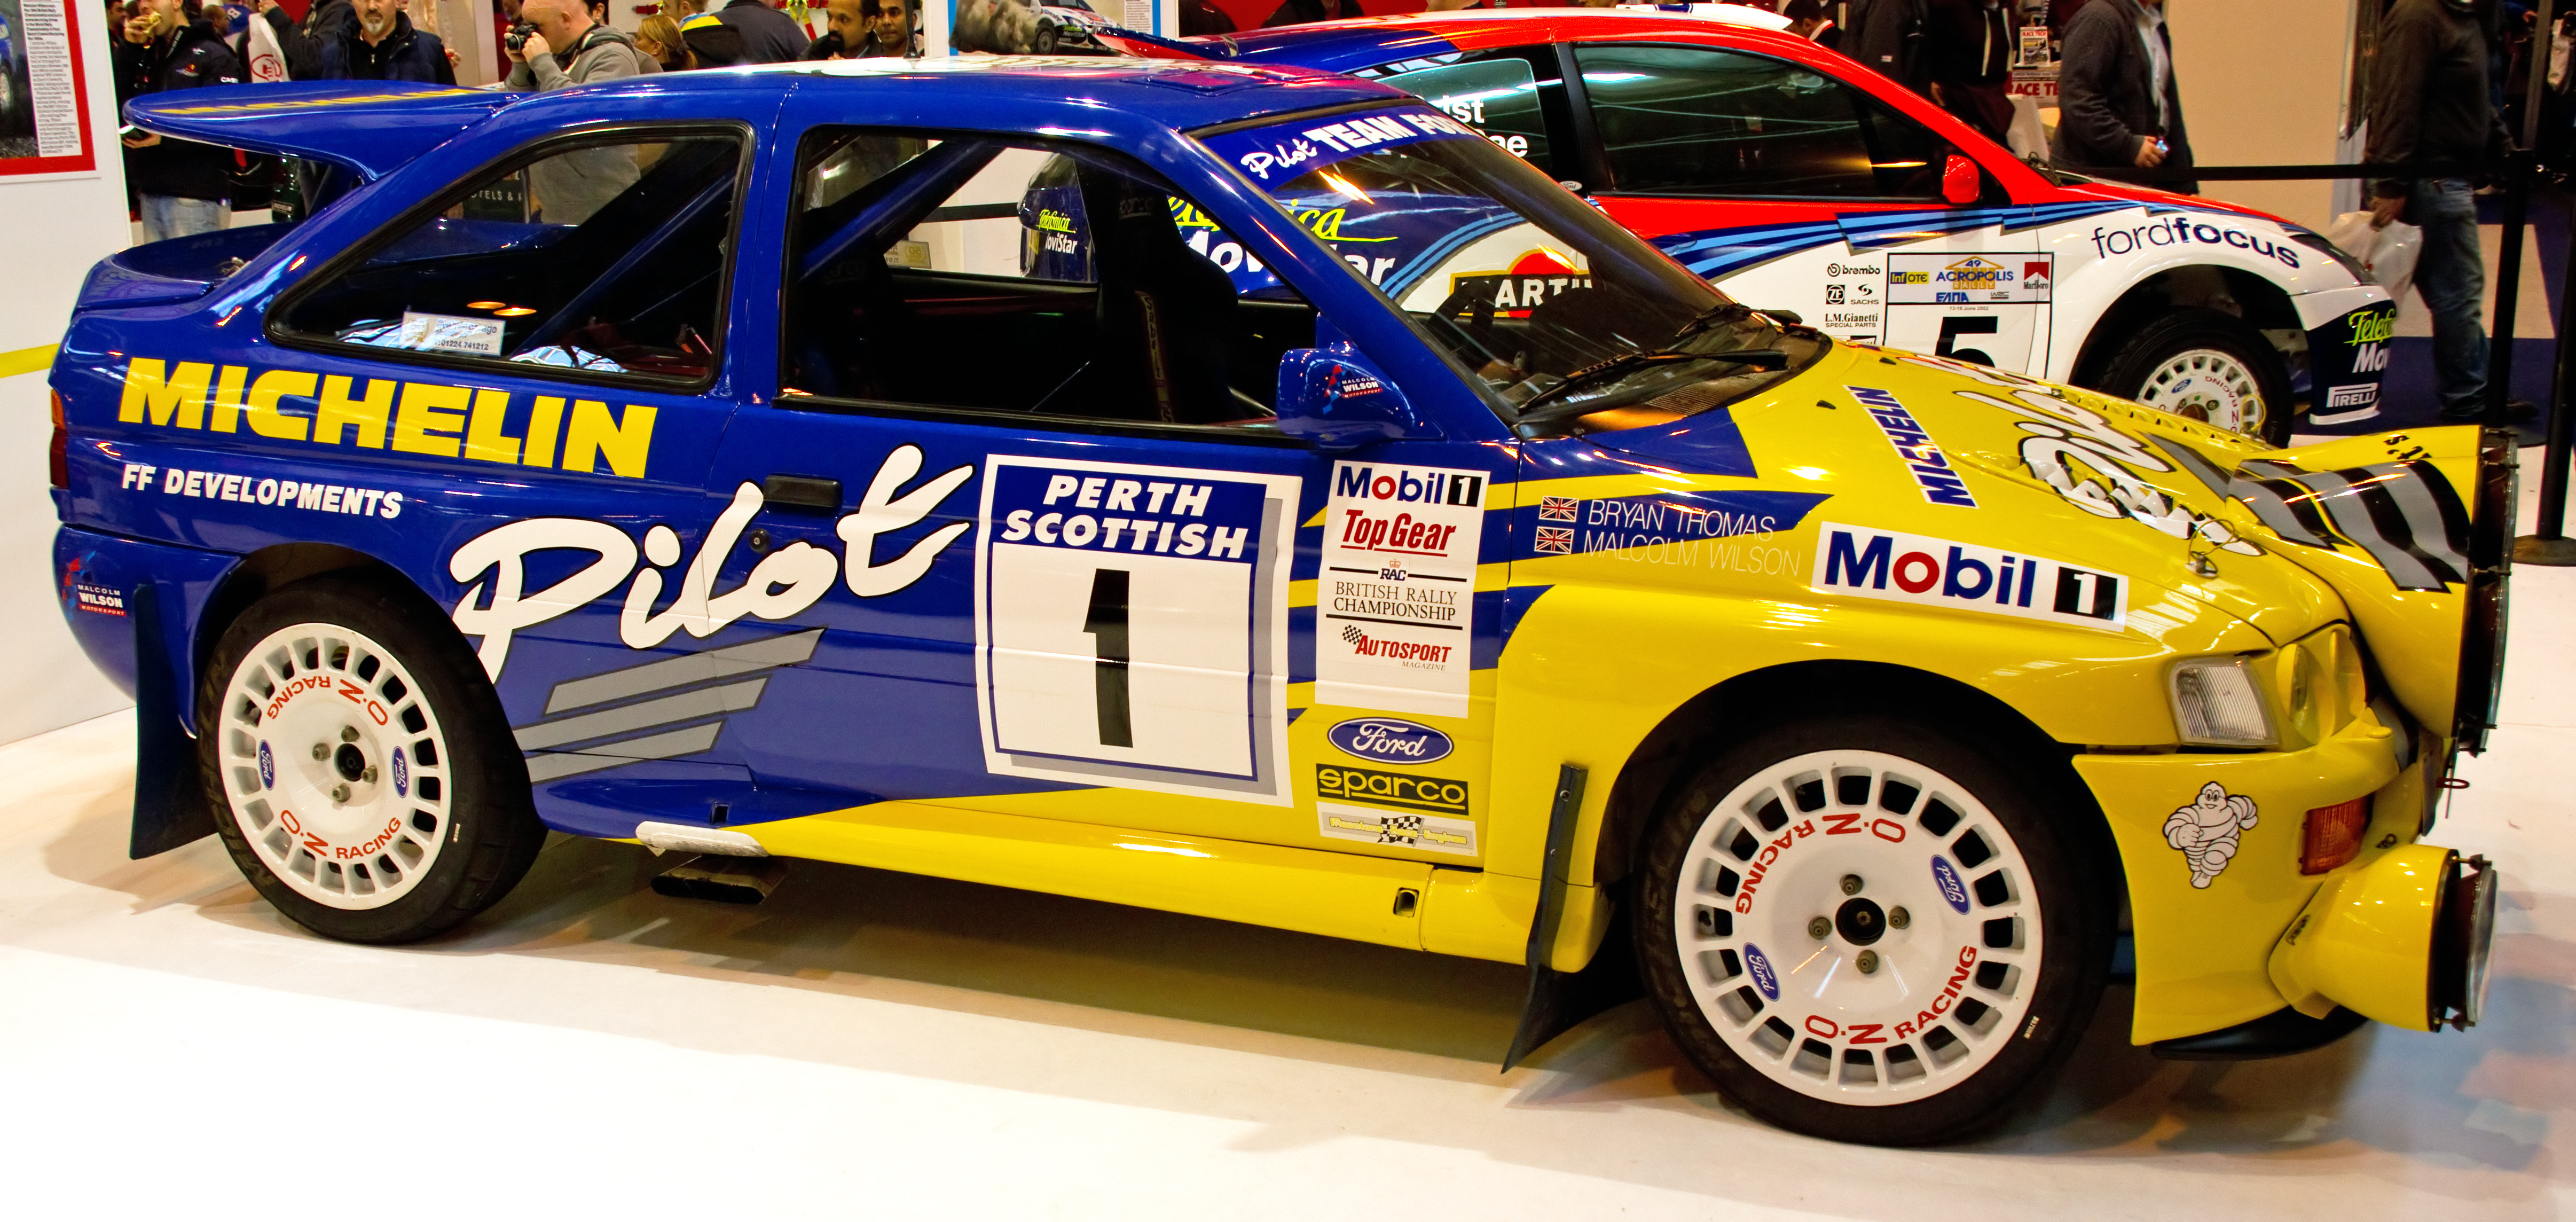 Http Mobil Michelin De Reifen Fahrzeug Mercedes C Klasse